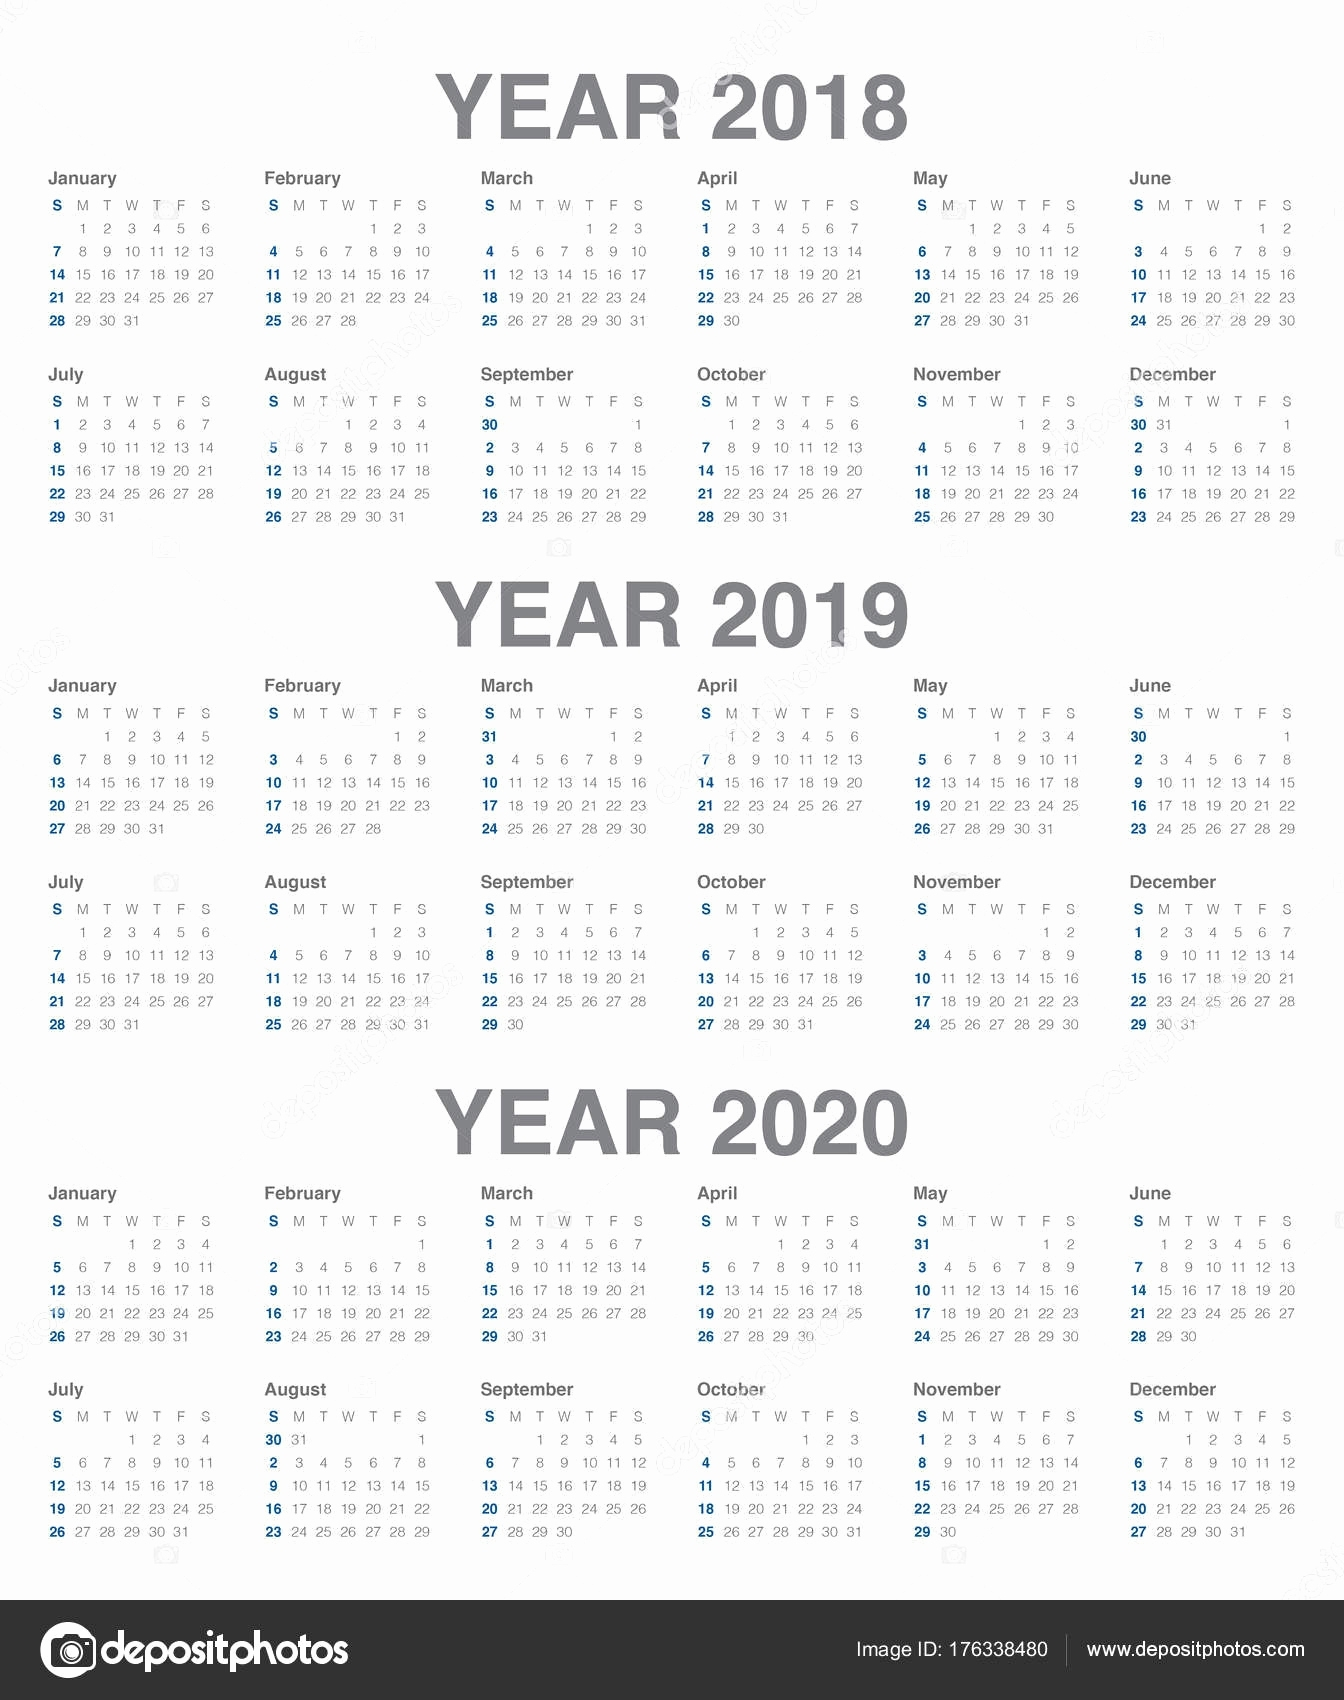 Iupui Academic Calendar 2020 | Free Printable Calendar